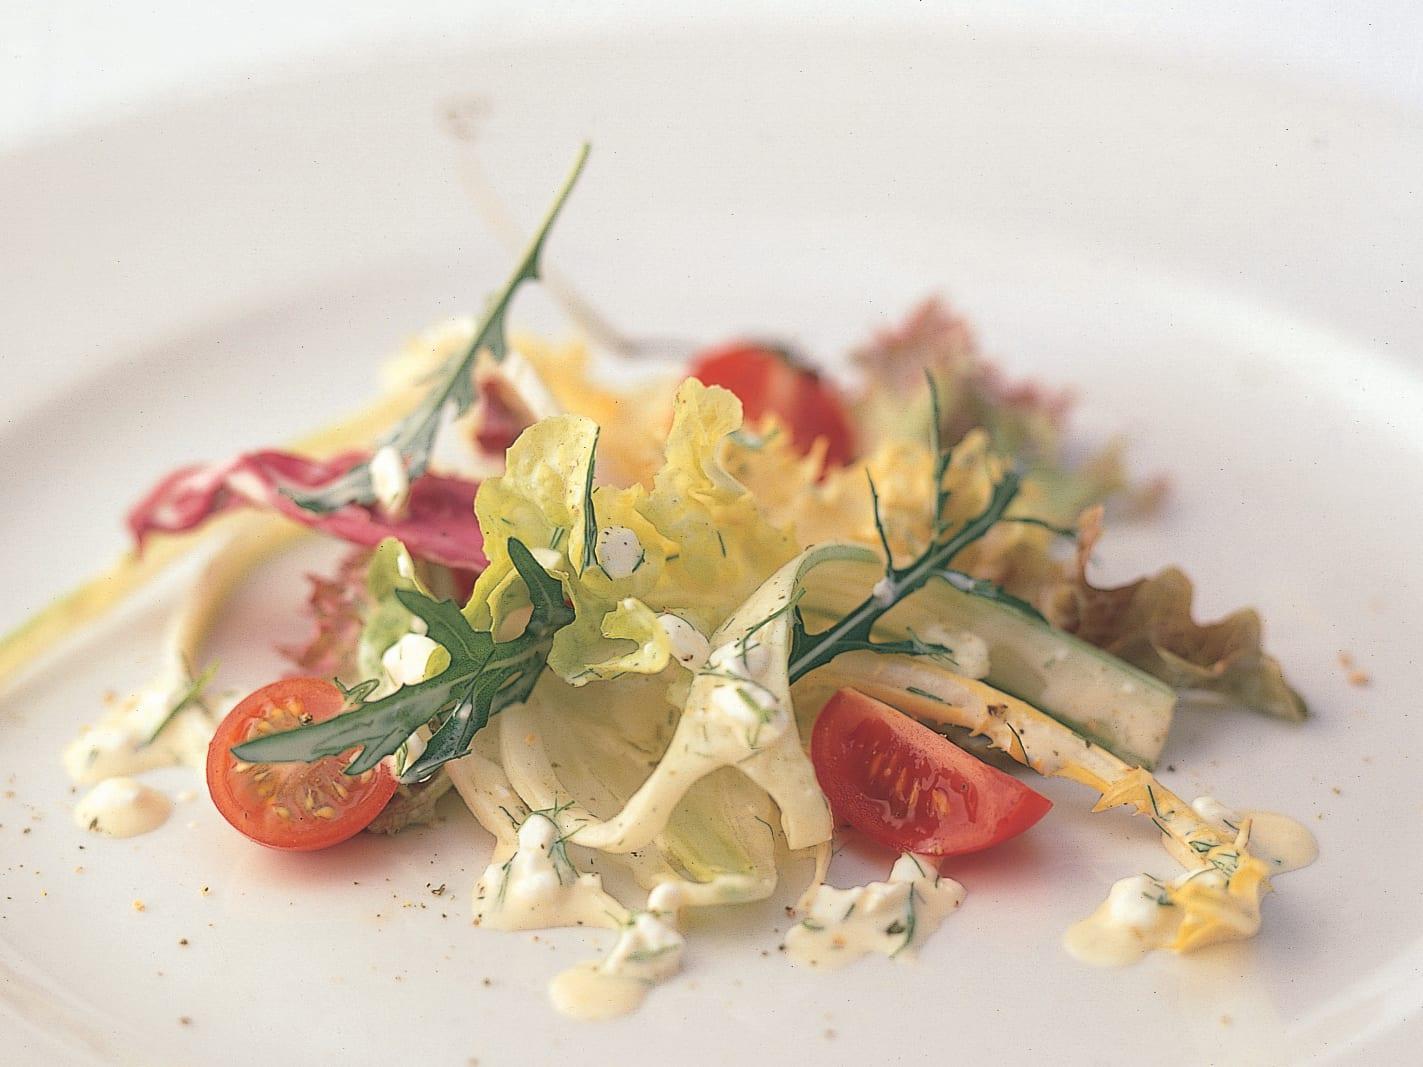 Salade estivale au fromage frais granulé